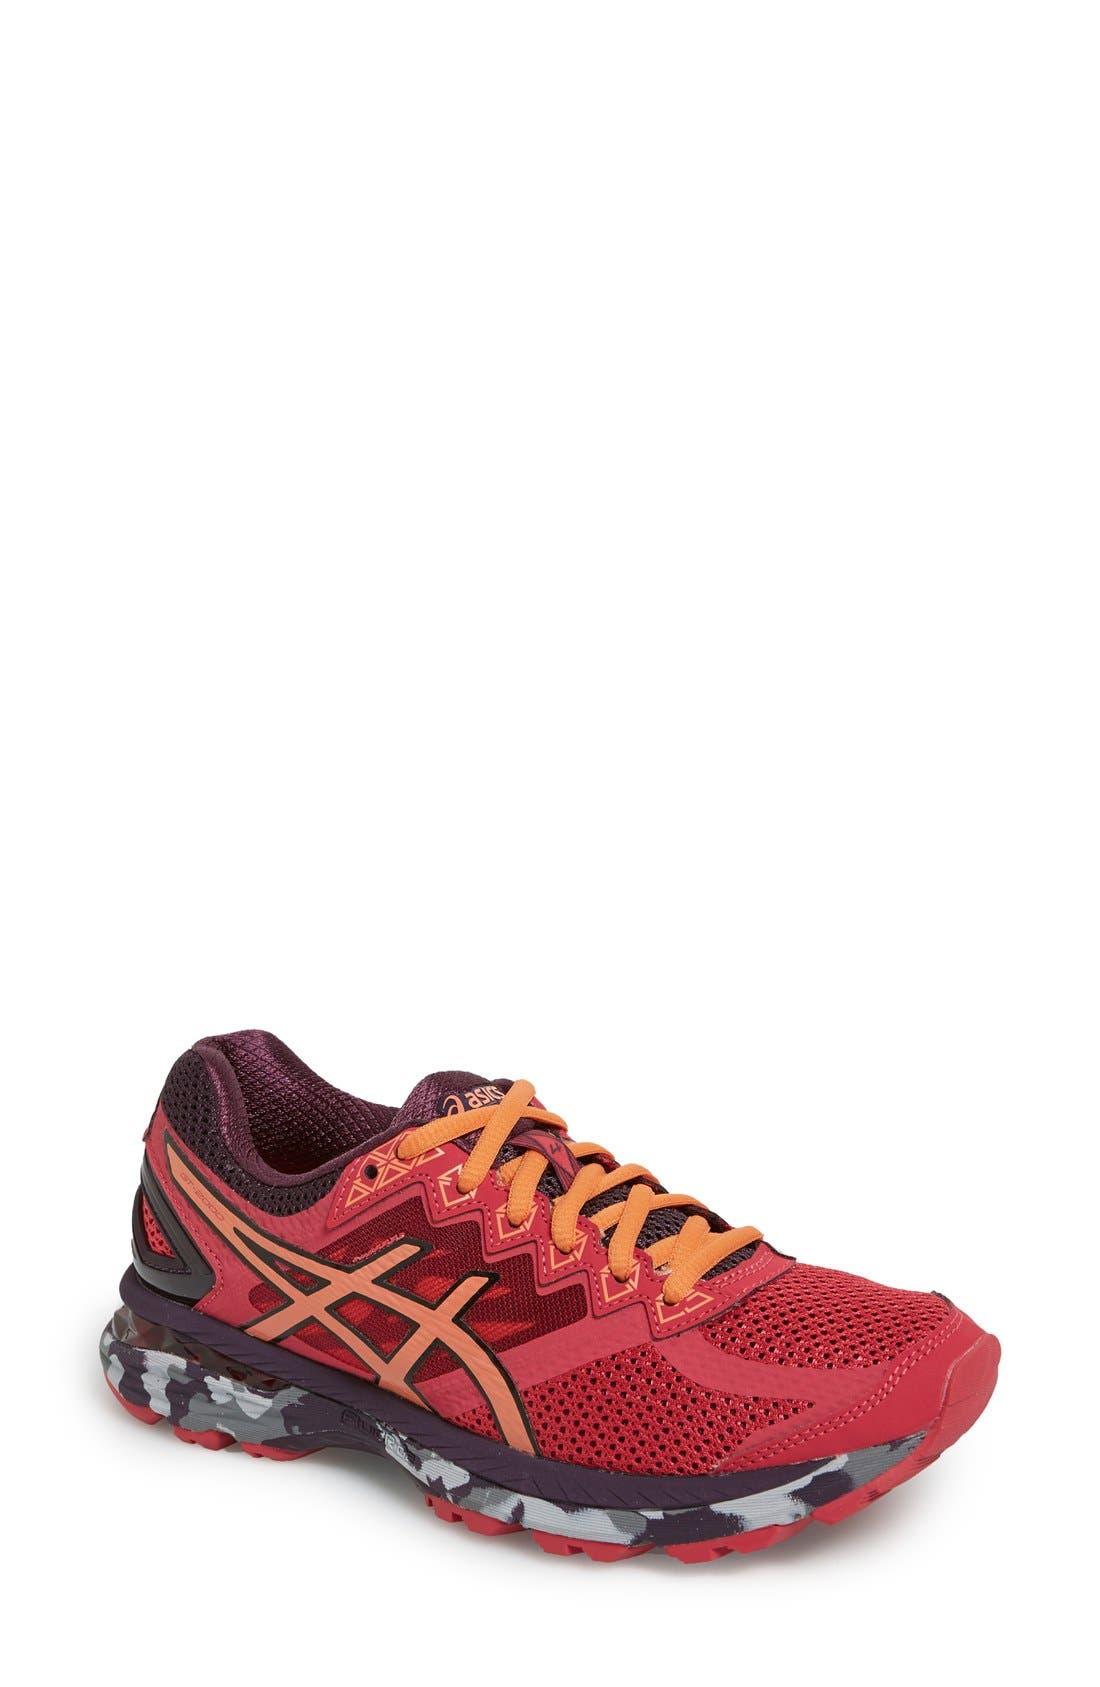 Main Image - ASICS® 'GT-2000 4' Trail Running Shoe (Women)